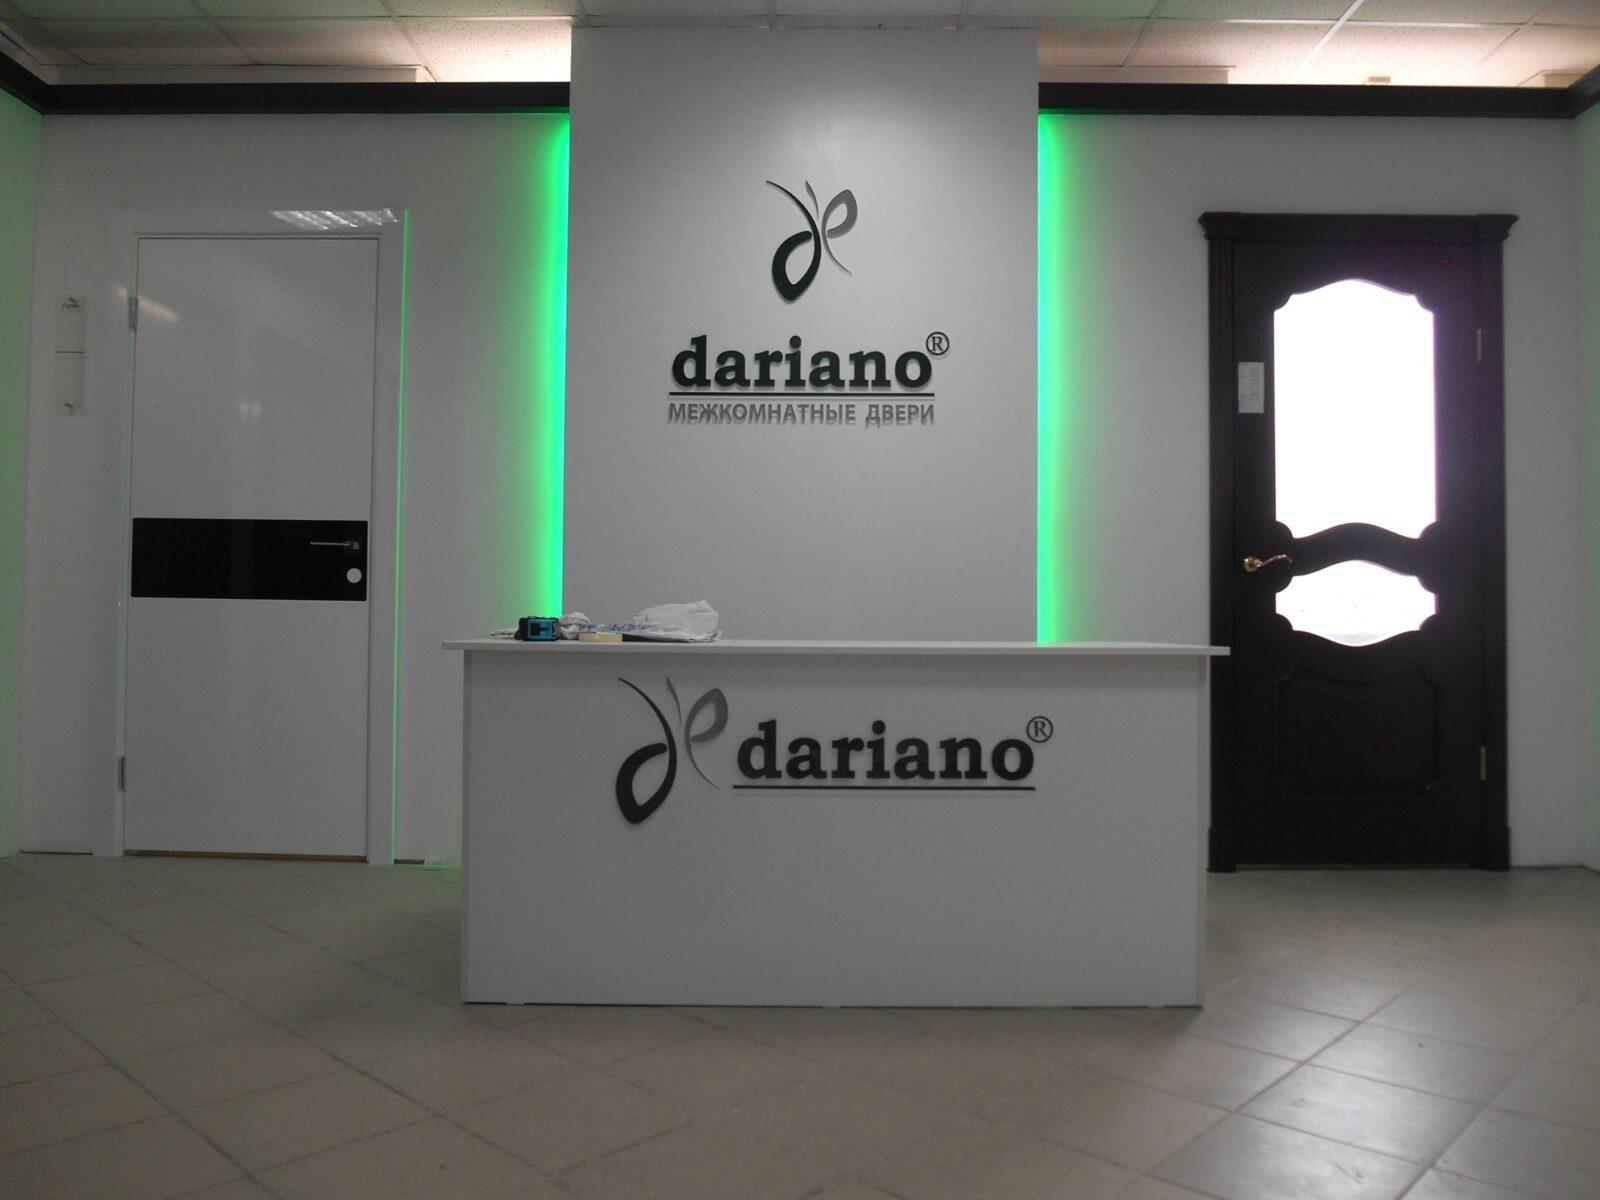 DarianoInterier (2)